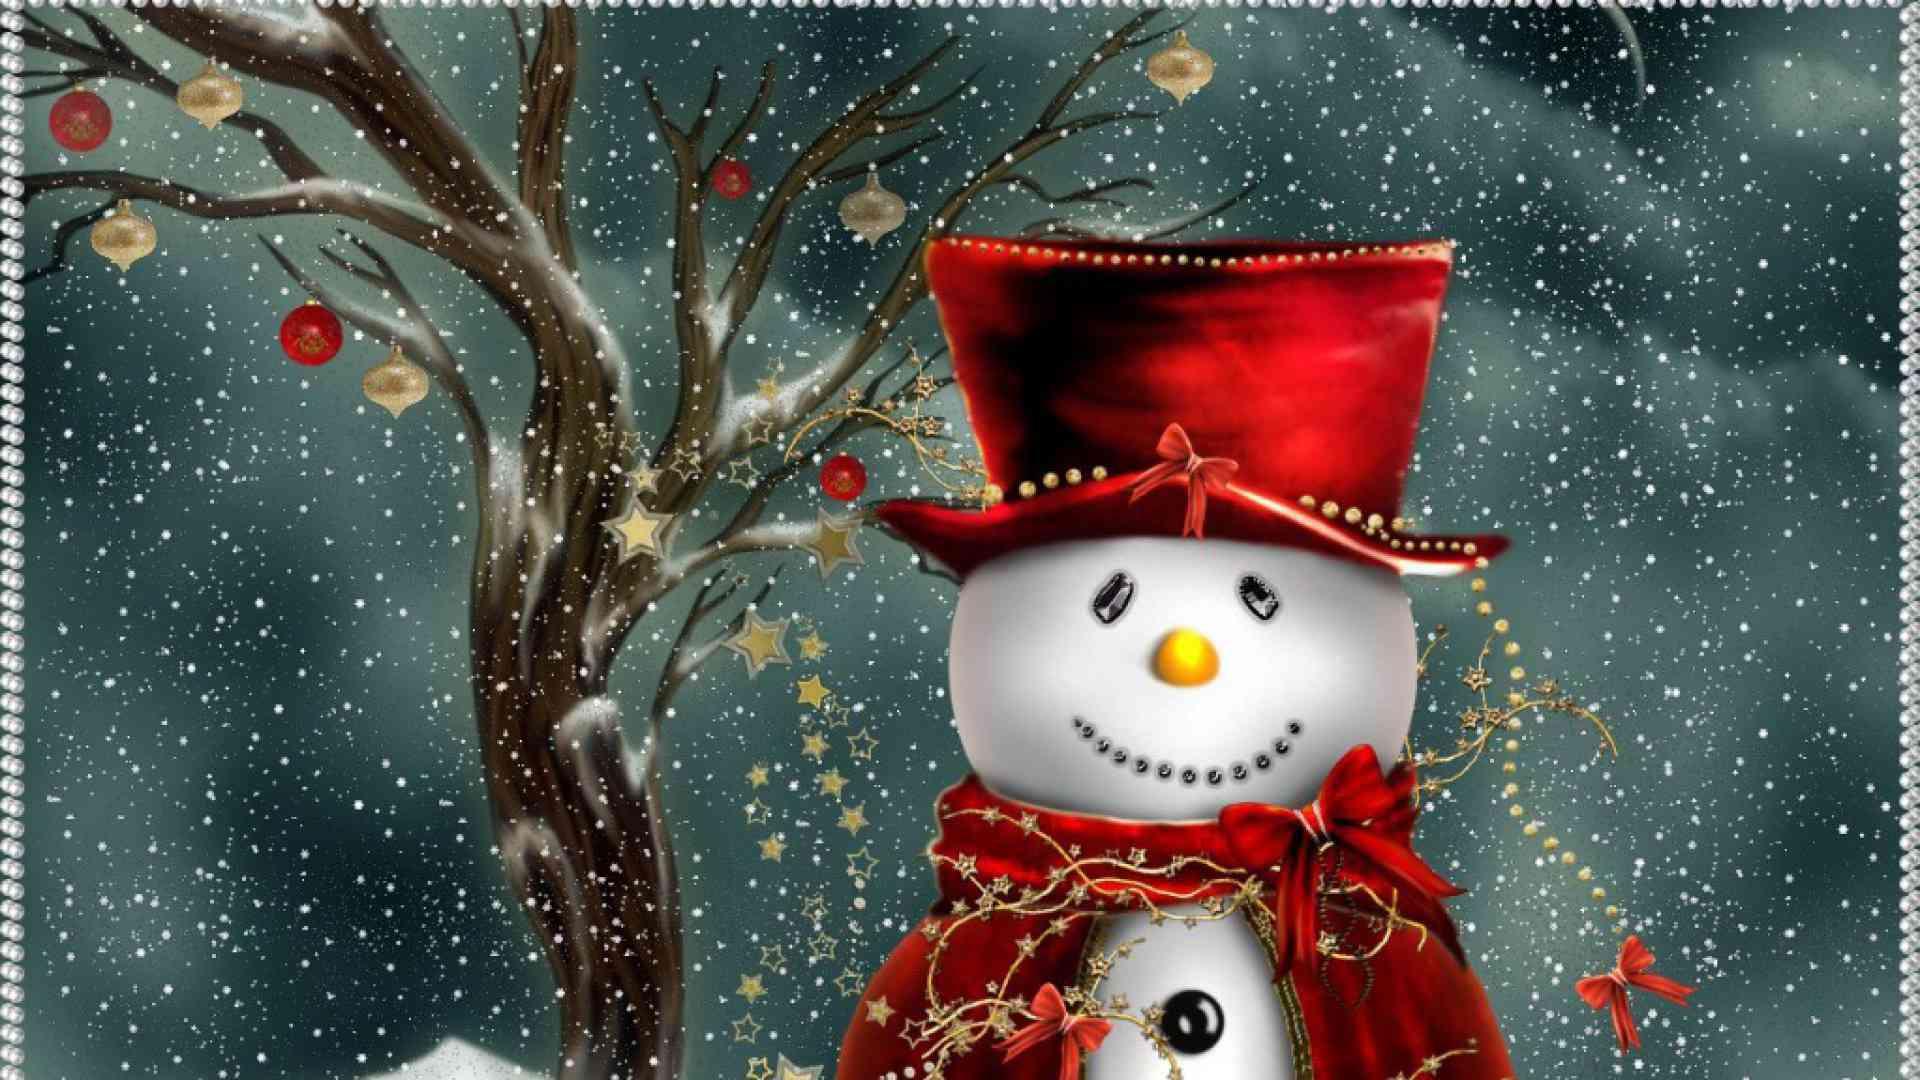 Get Free Christmas Wallpaper Downloads